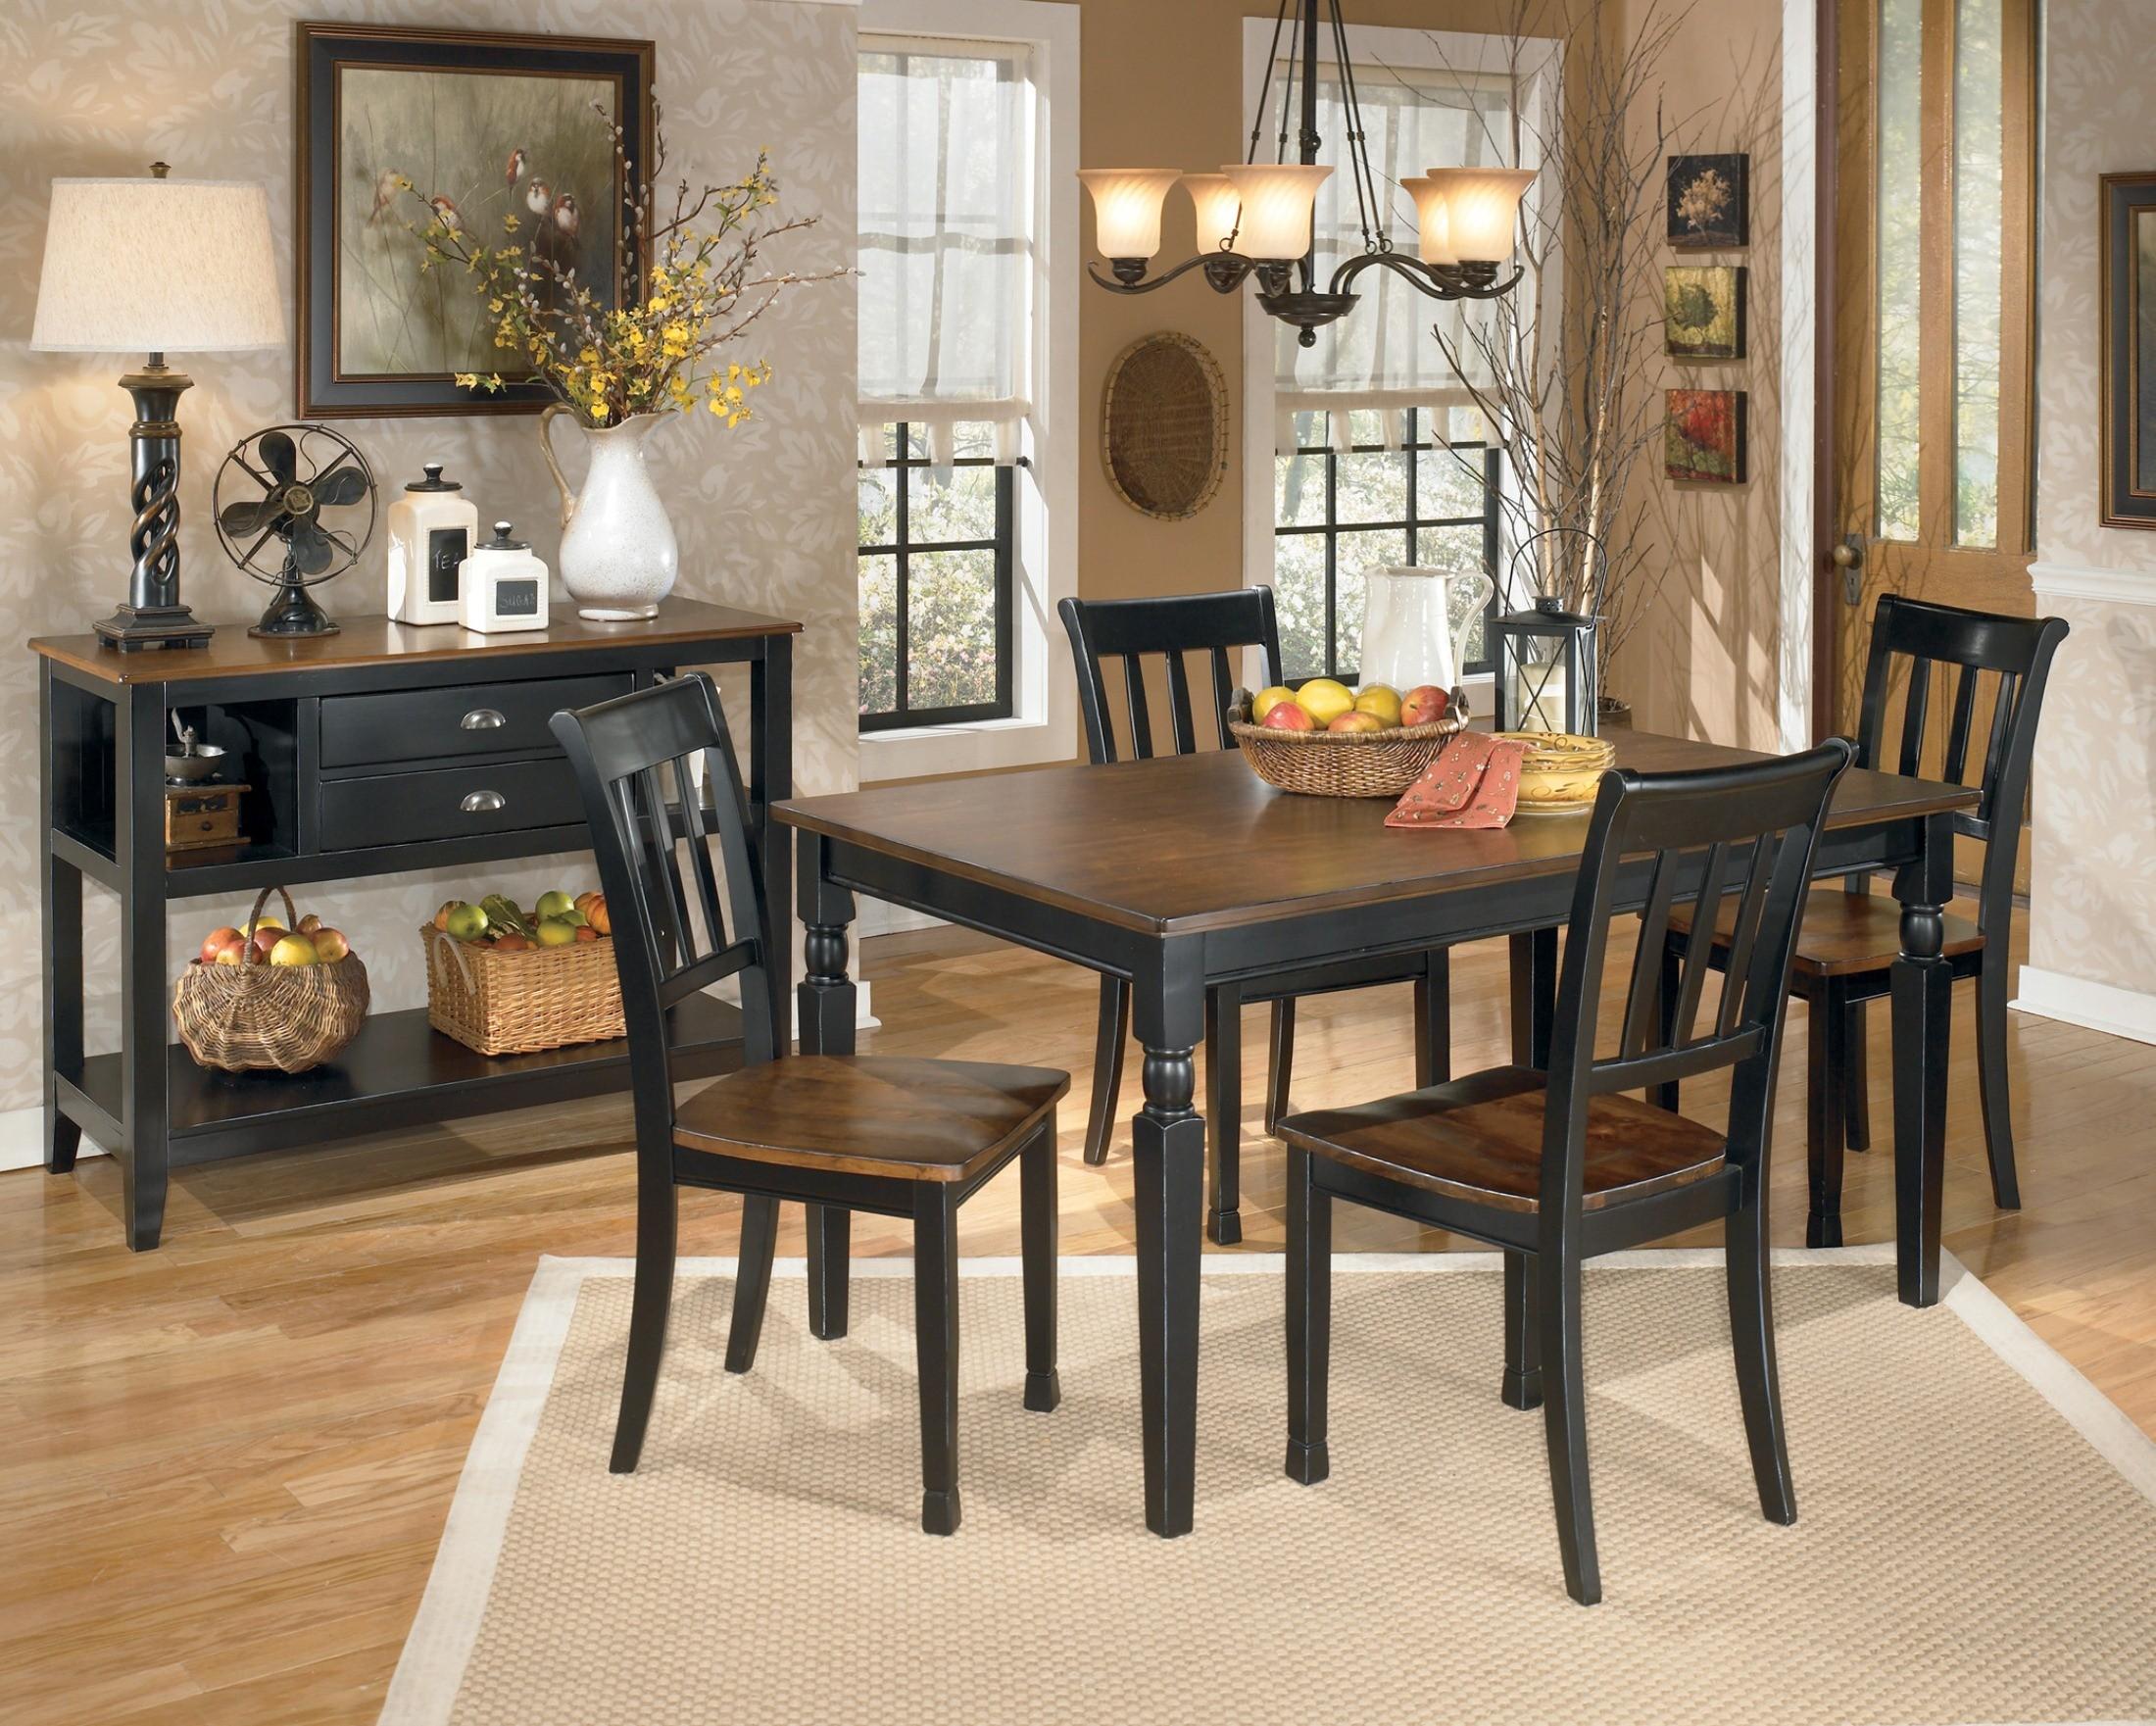 Owingsville Rectangular Dining Room Set From Ashley D580